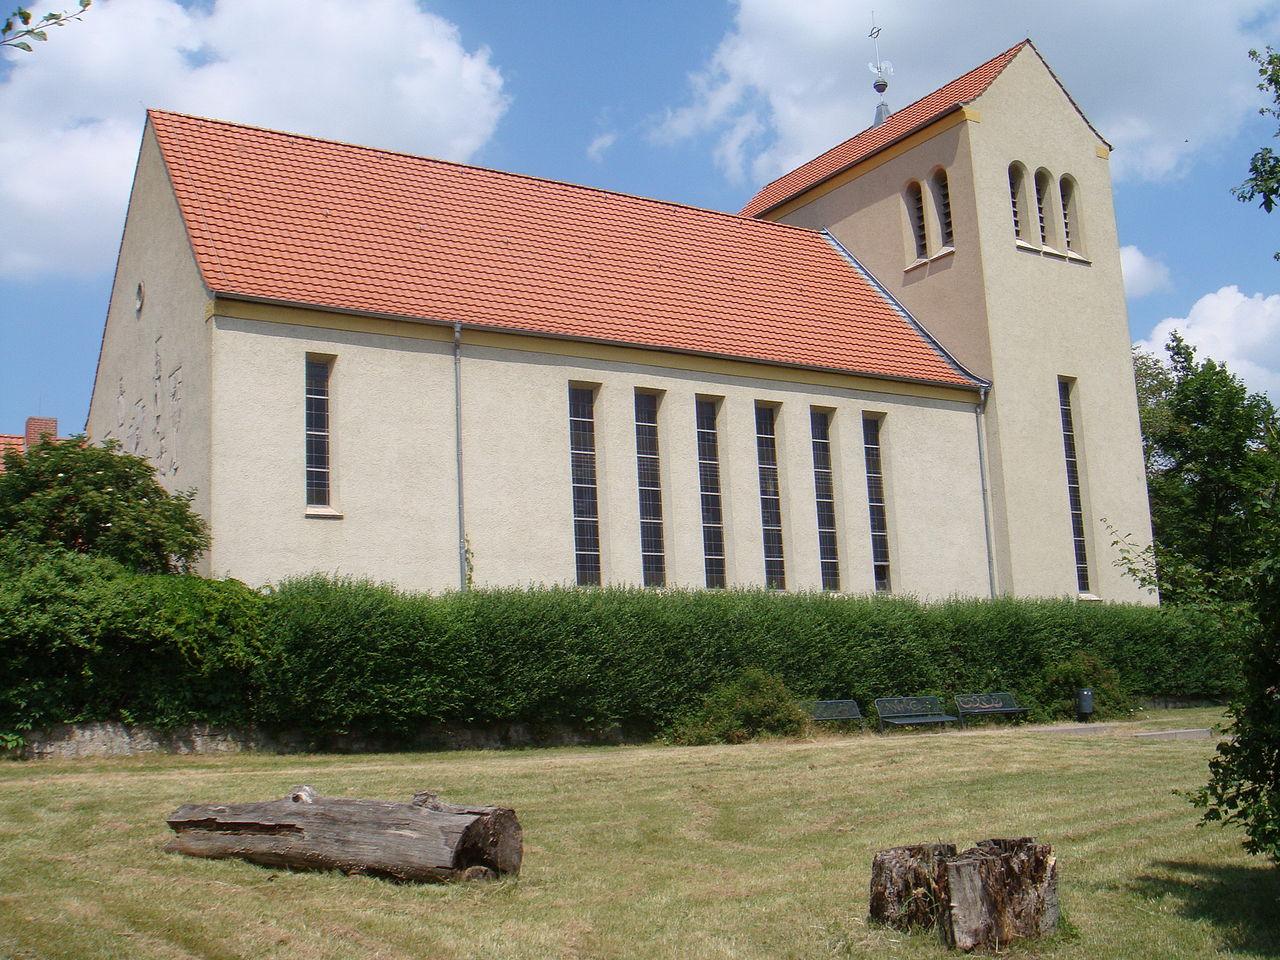 Bild Karmelitinnenkloster St. Teresa Weimar